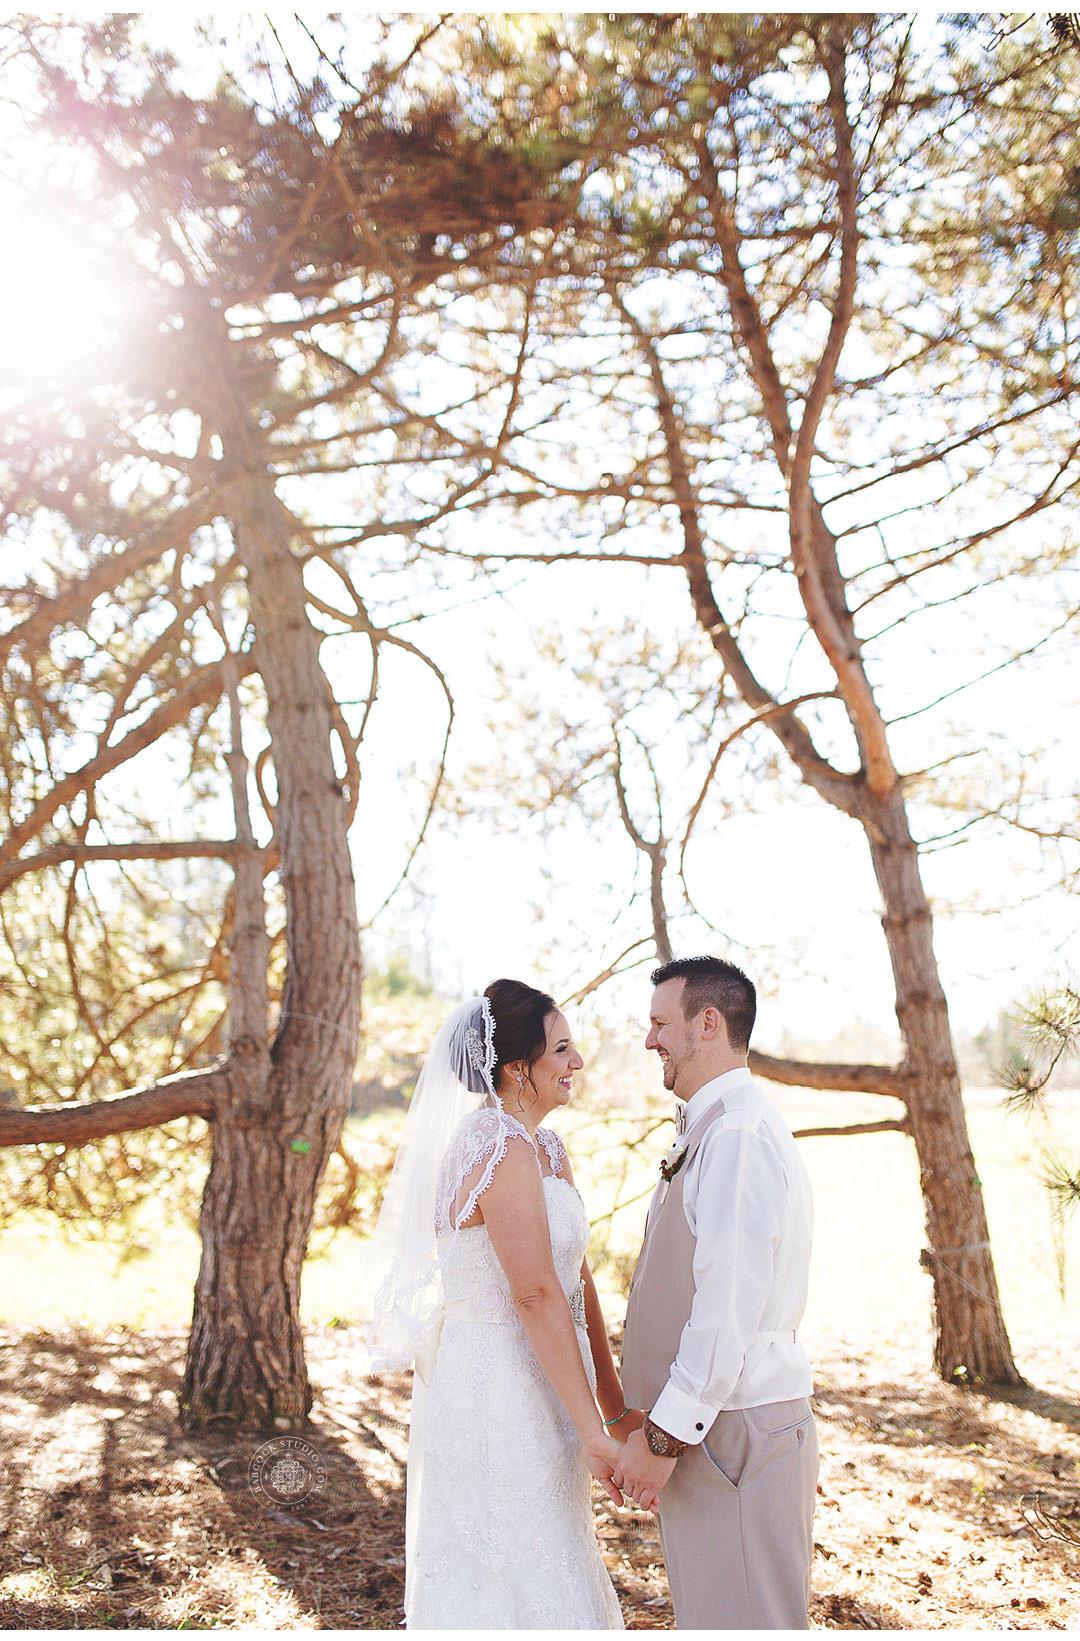 0001_sarah-john--dayton-wedding-photographer-cox-arboretum-12.jpg